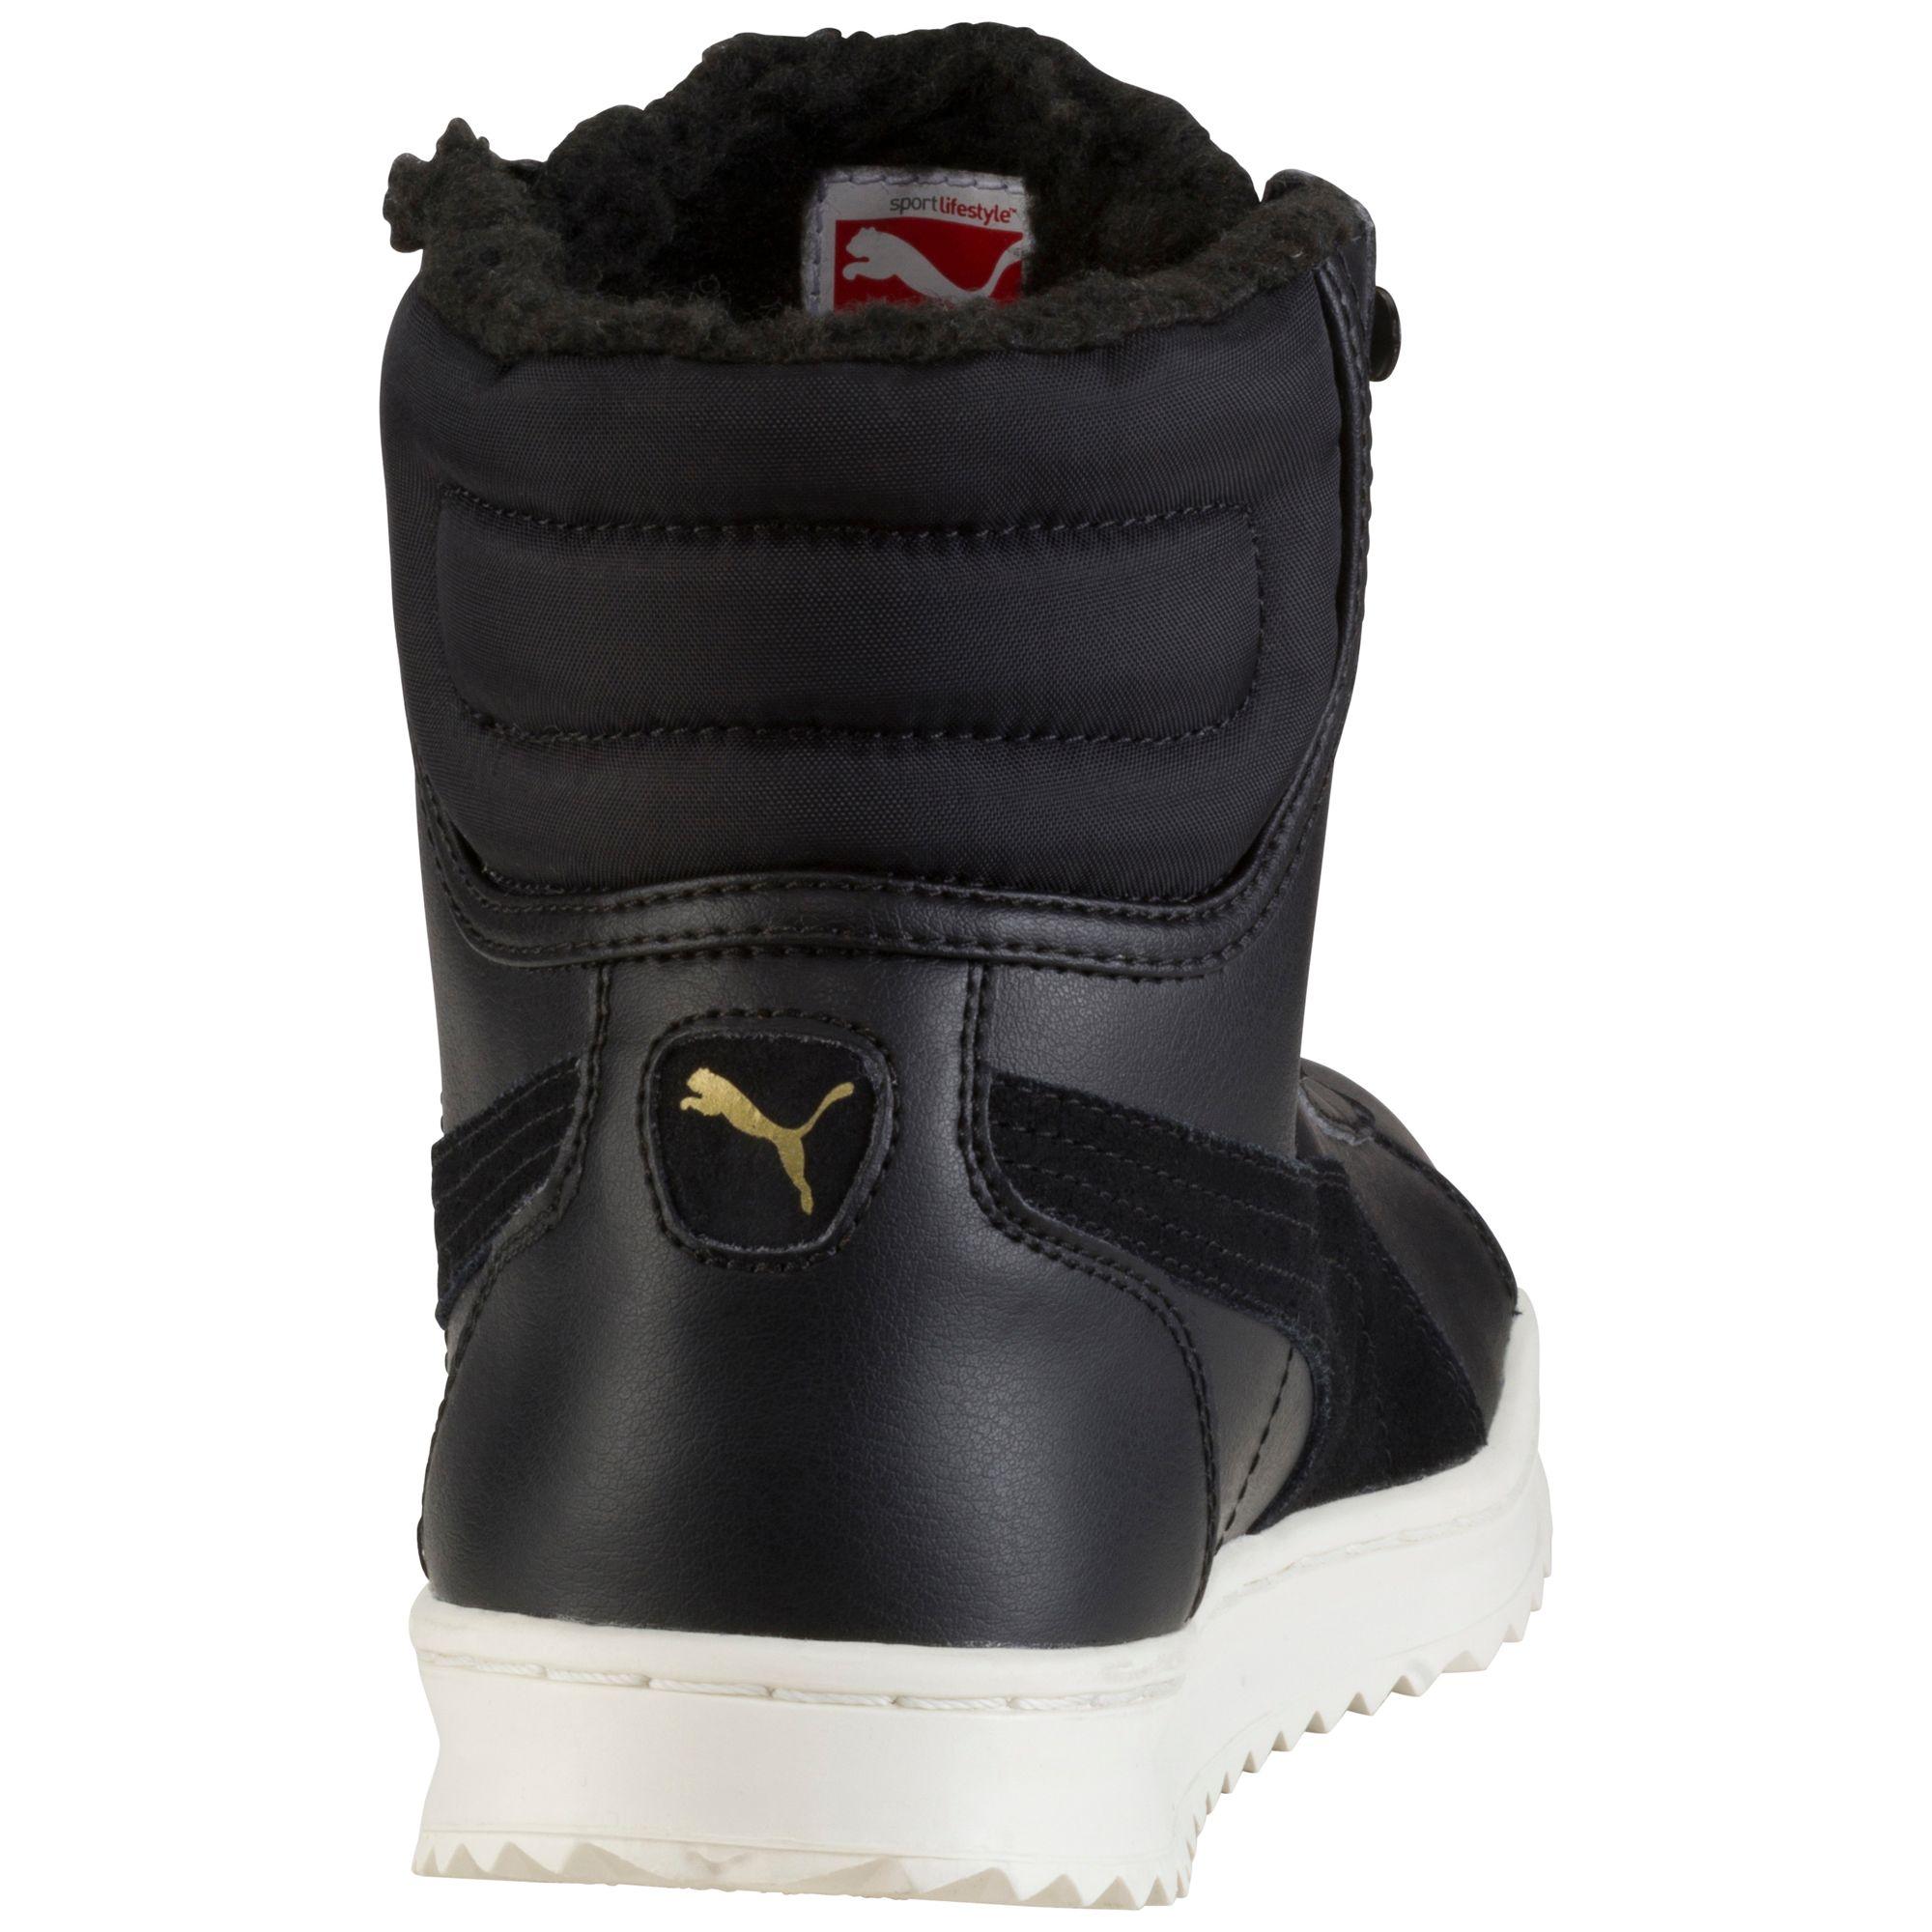 PUMA Victory Winter Boots Footwear Winter Shoes Sport Classics Women ... 97abf5374